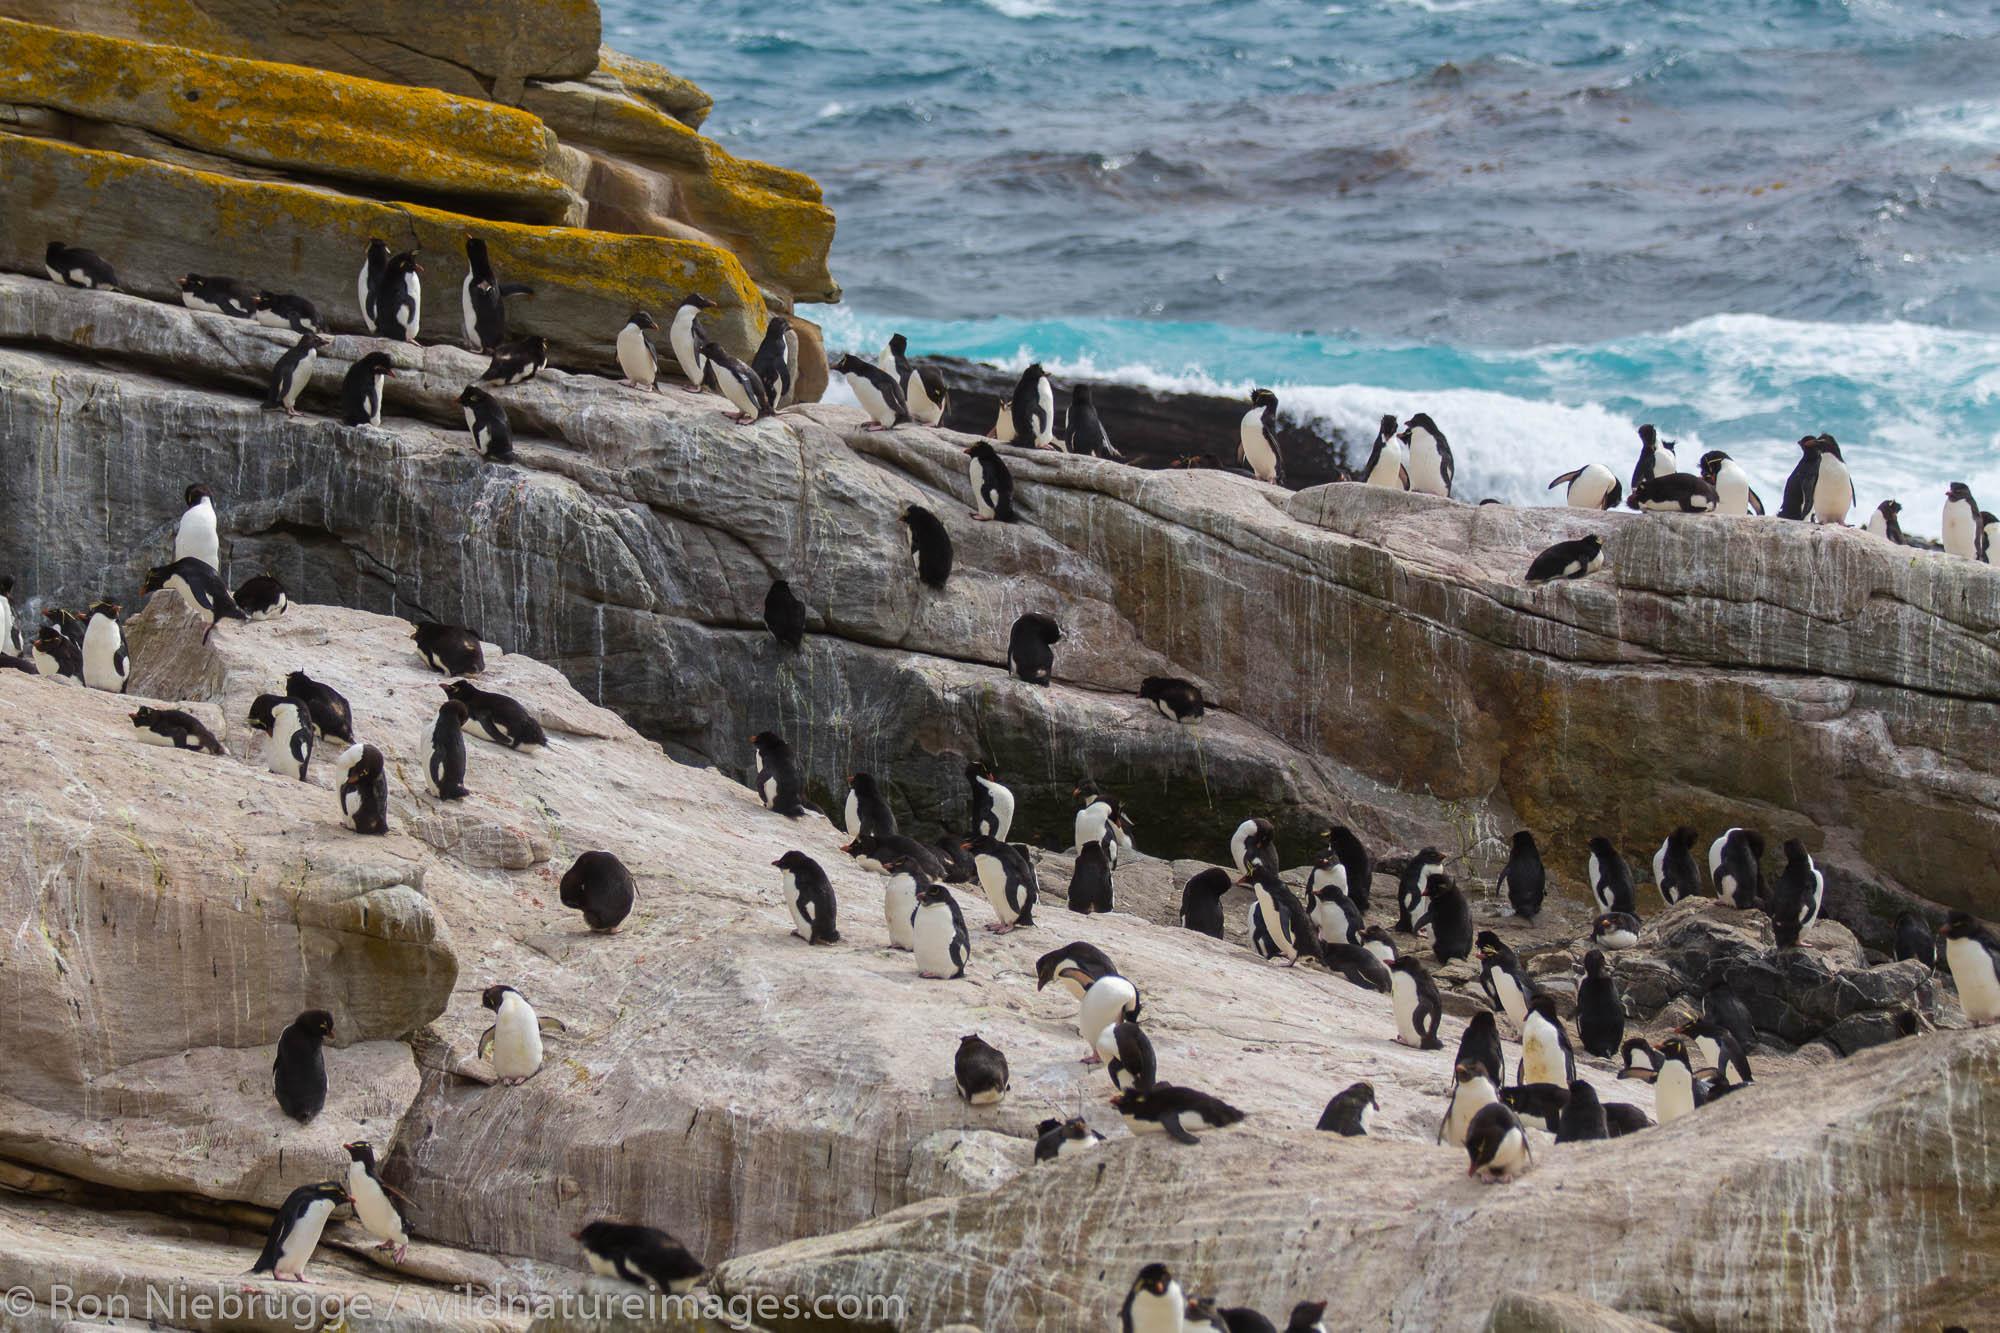 Rockhopper penguin colony, New Island, Falkland Islands.